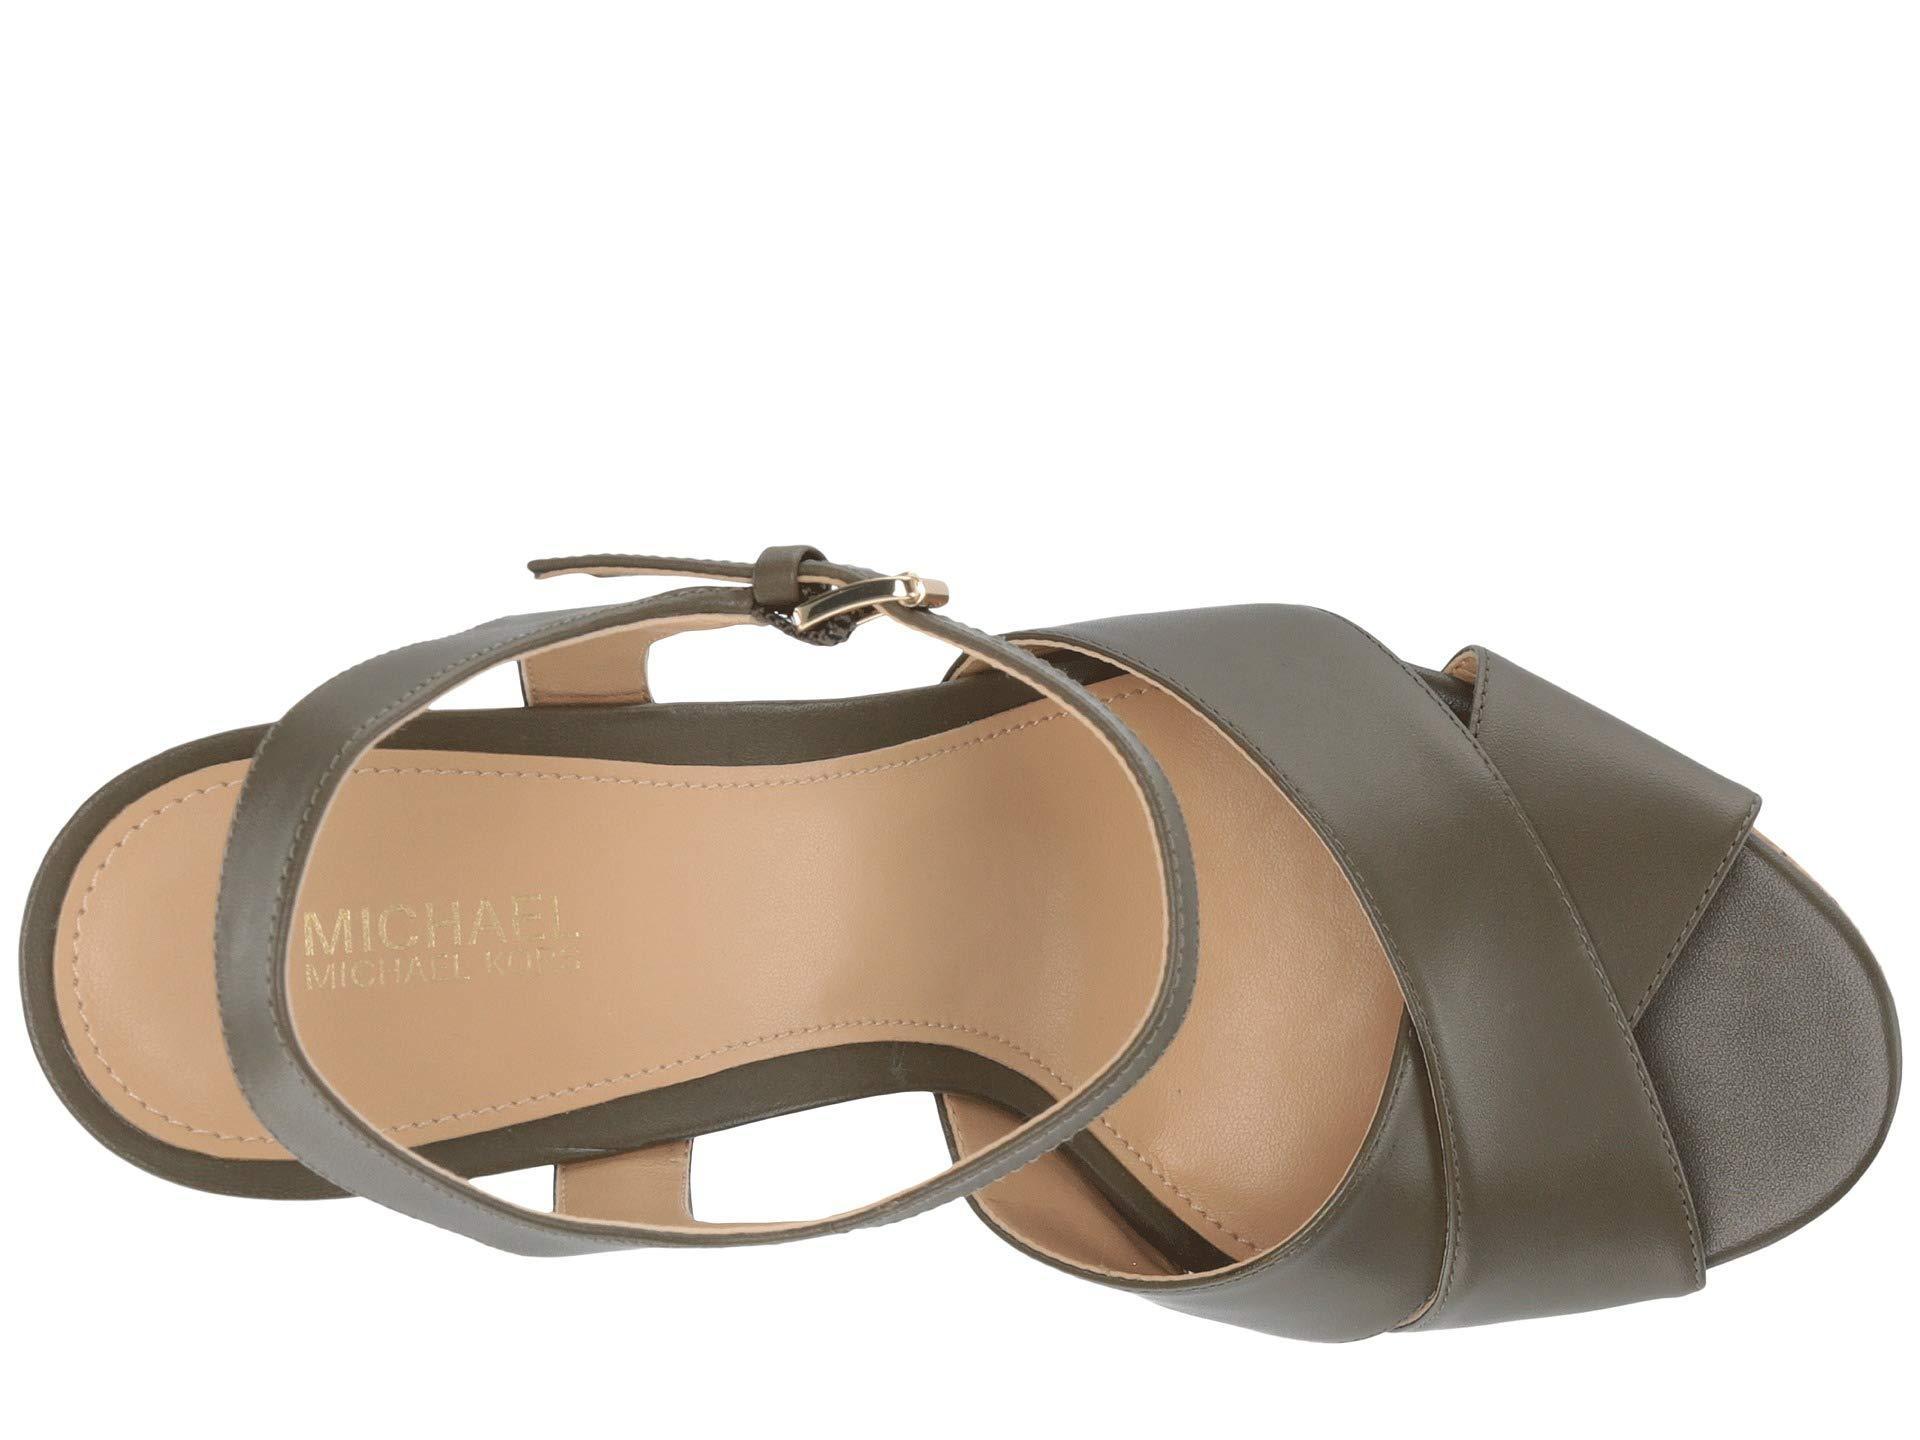 ffad35b02e MICHAEL Michael Kors - Multicolor Alexia Platform (olive Vachetta/cork)  Women's Shoes -. View fullscreen